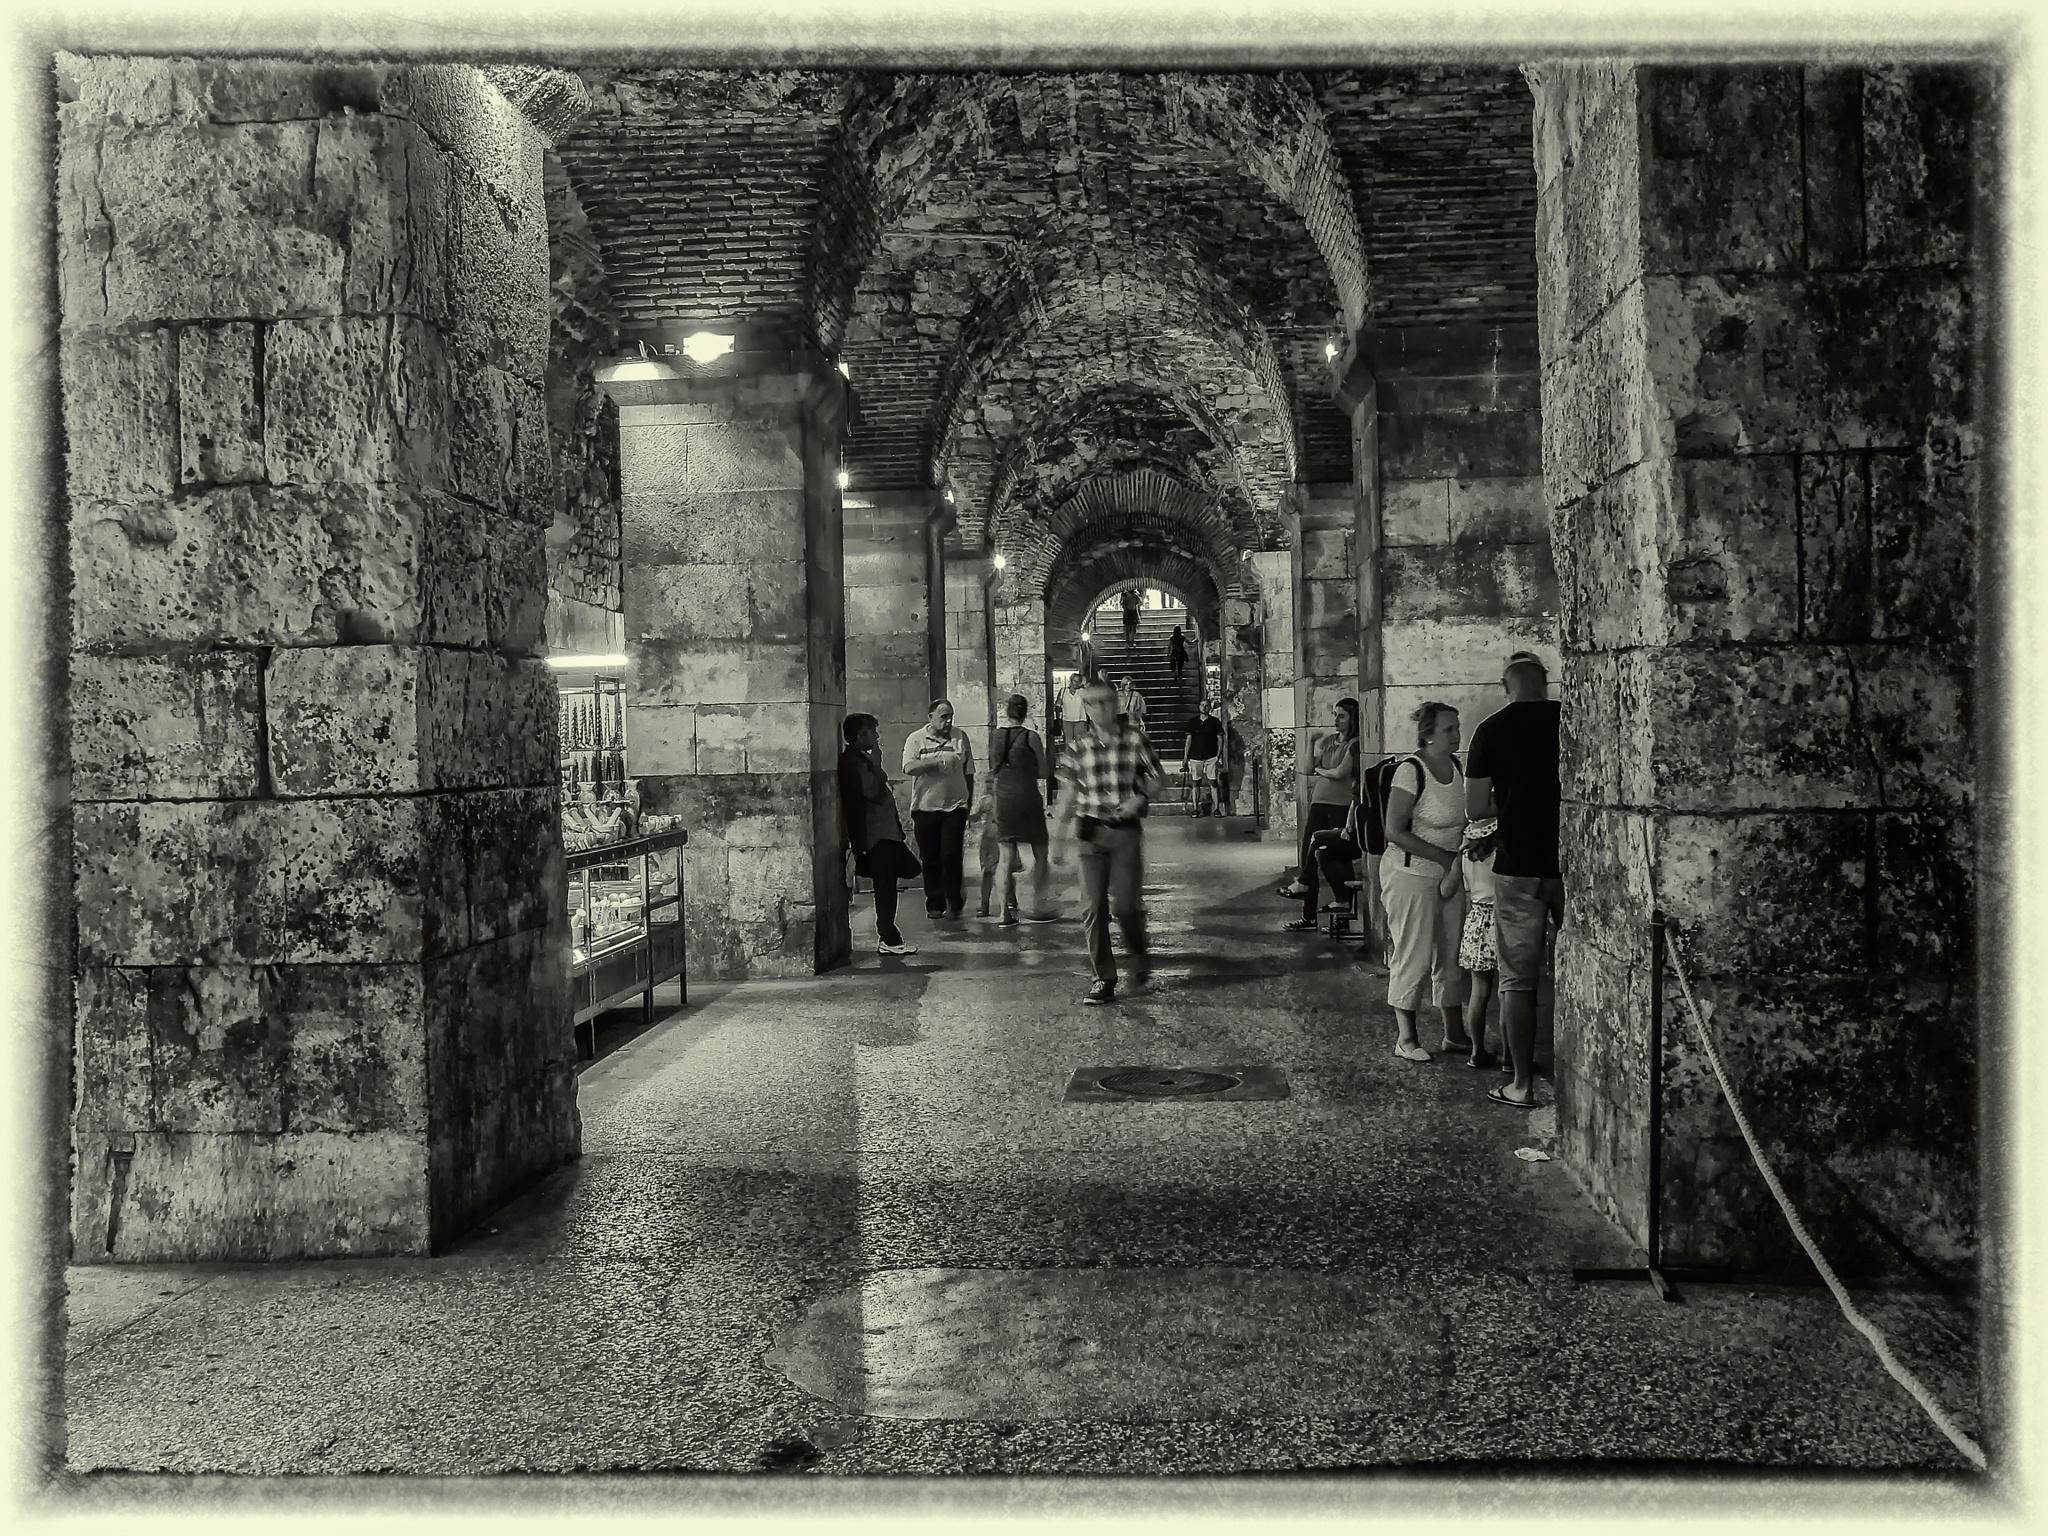 The Brass Gate-Split. by tlovh